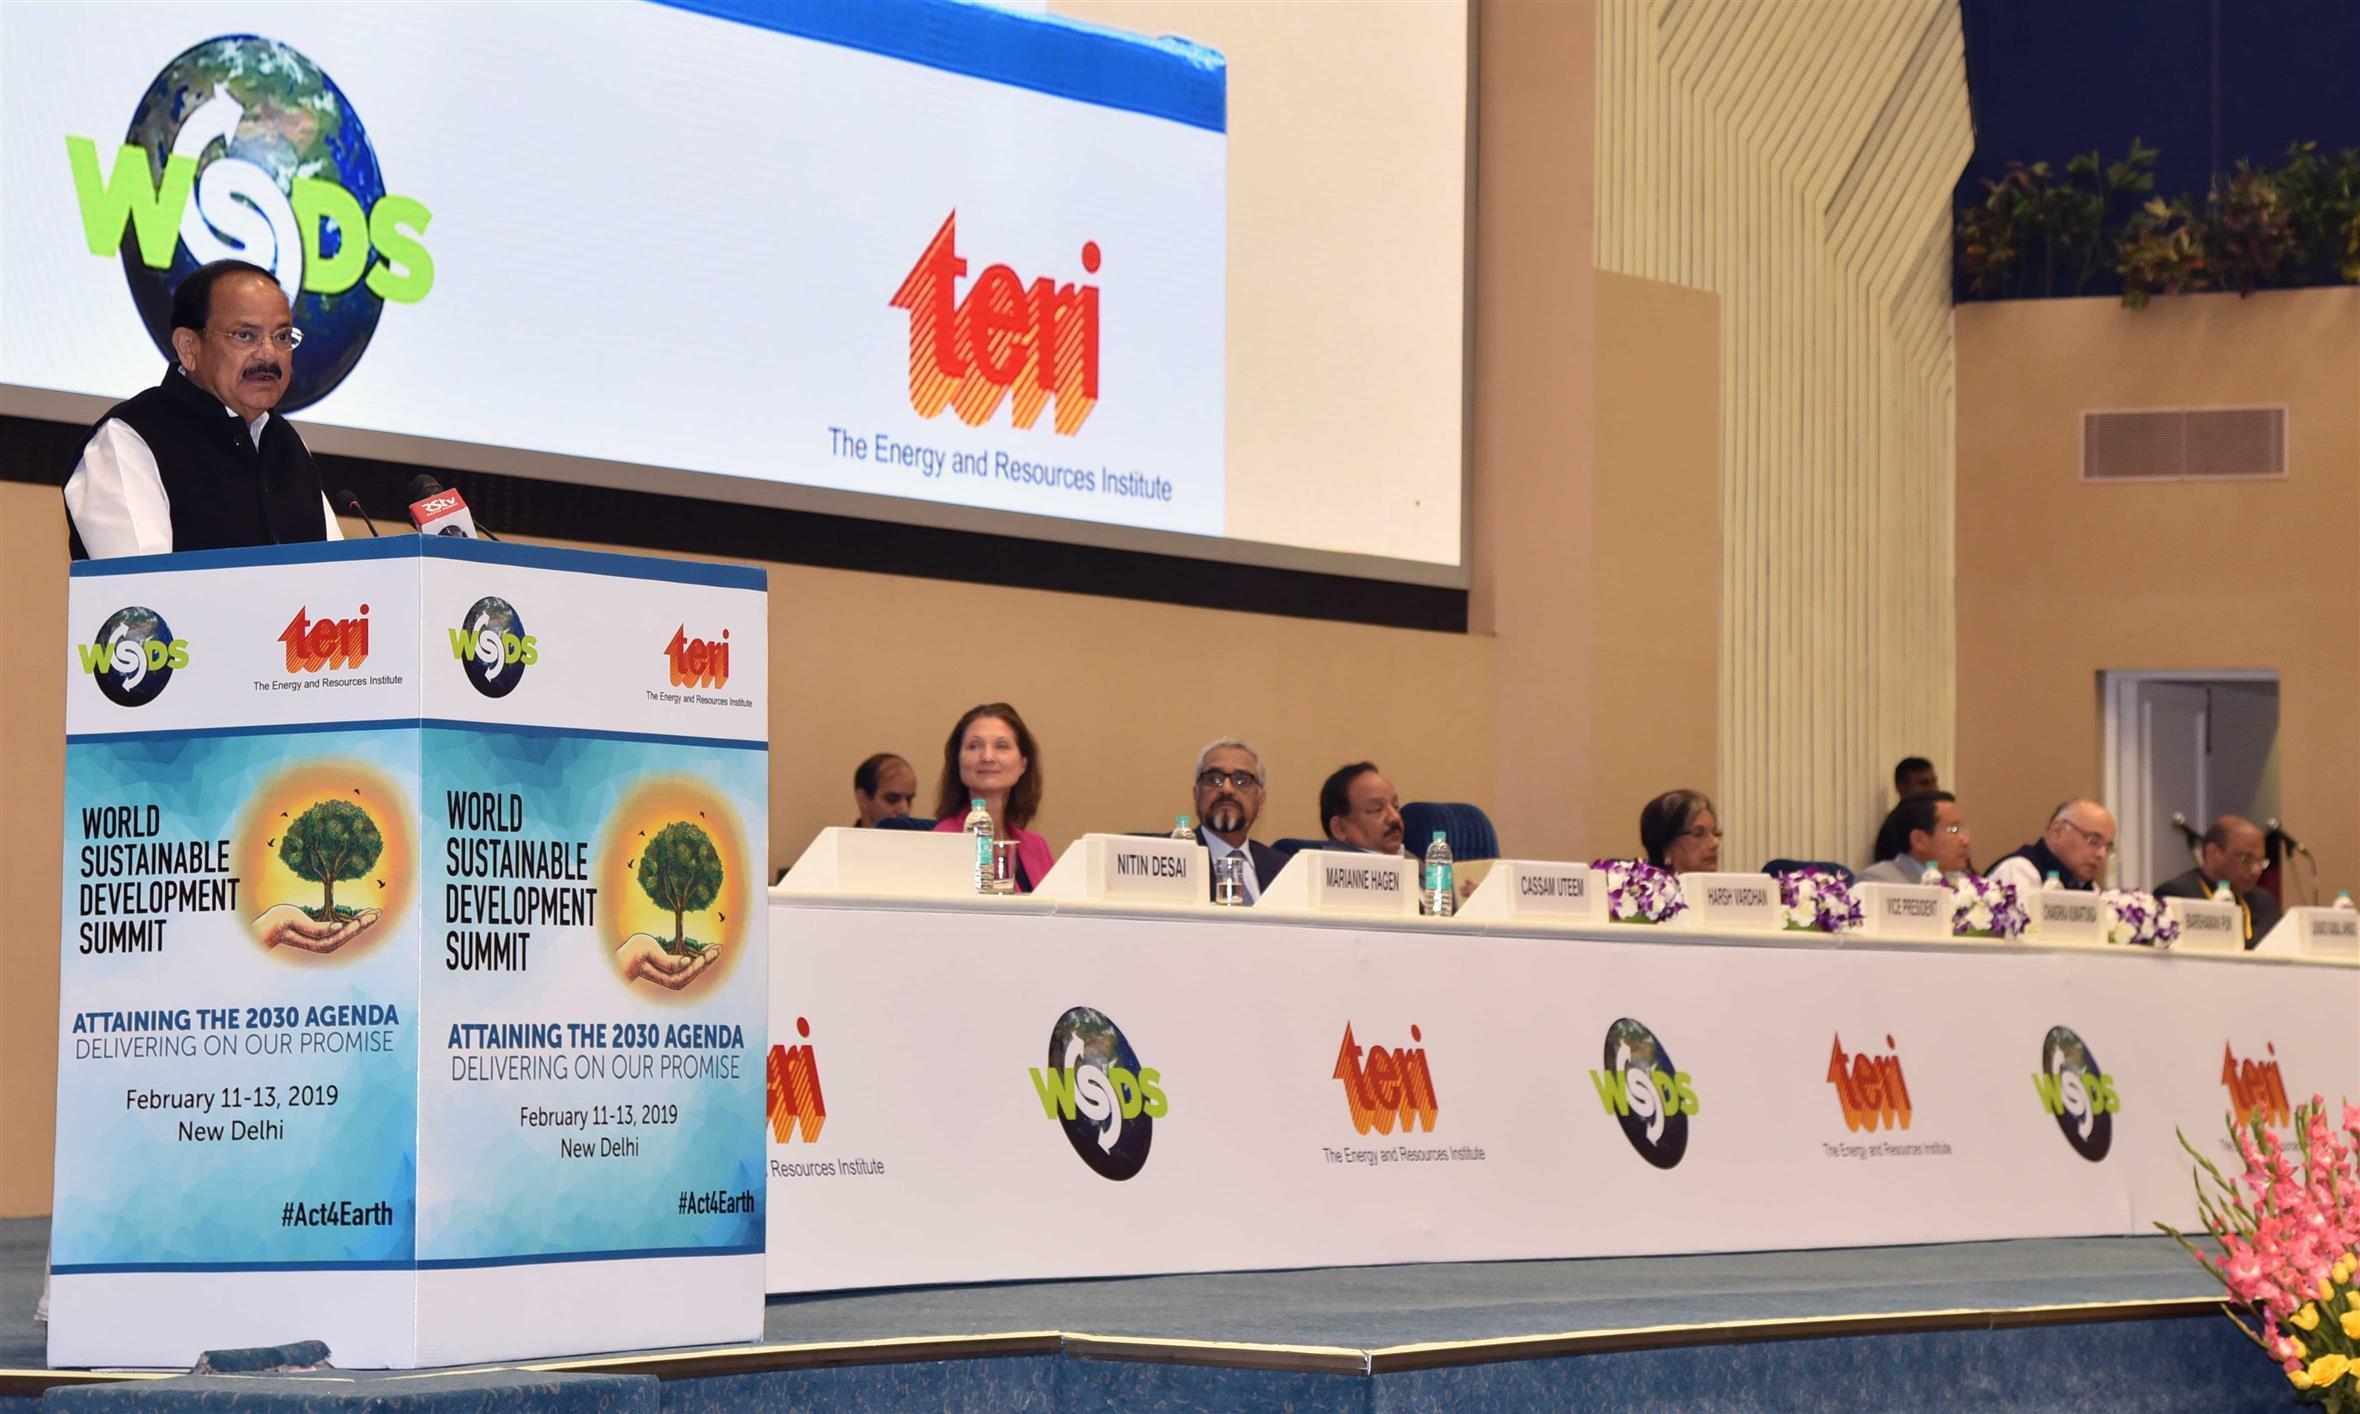 Vice President inaugurates World Sustainable Development Summit 2019